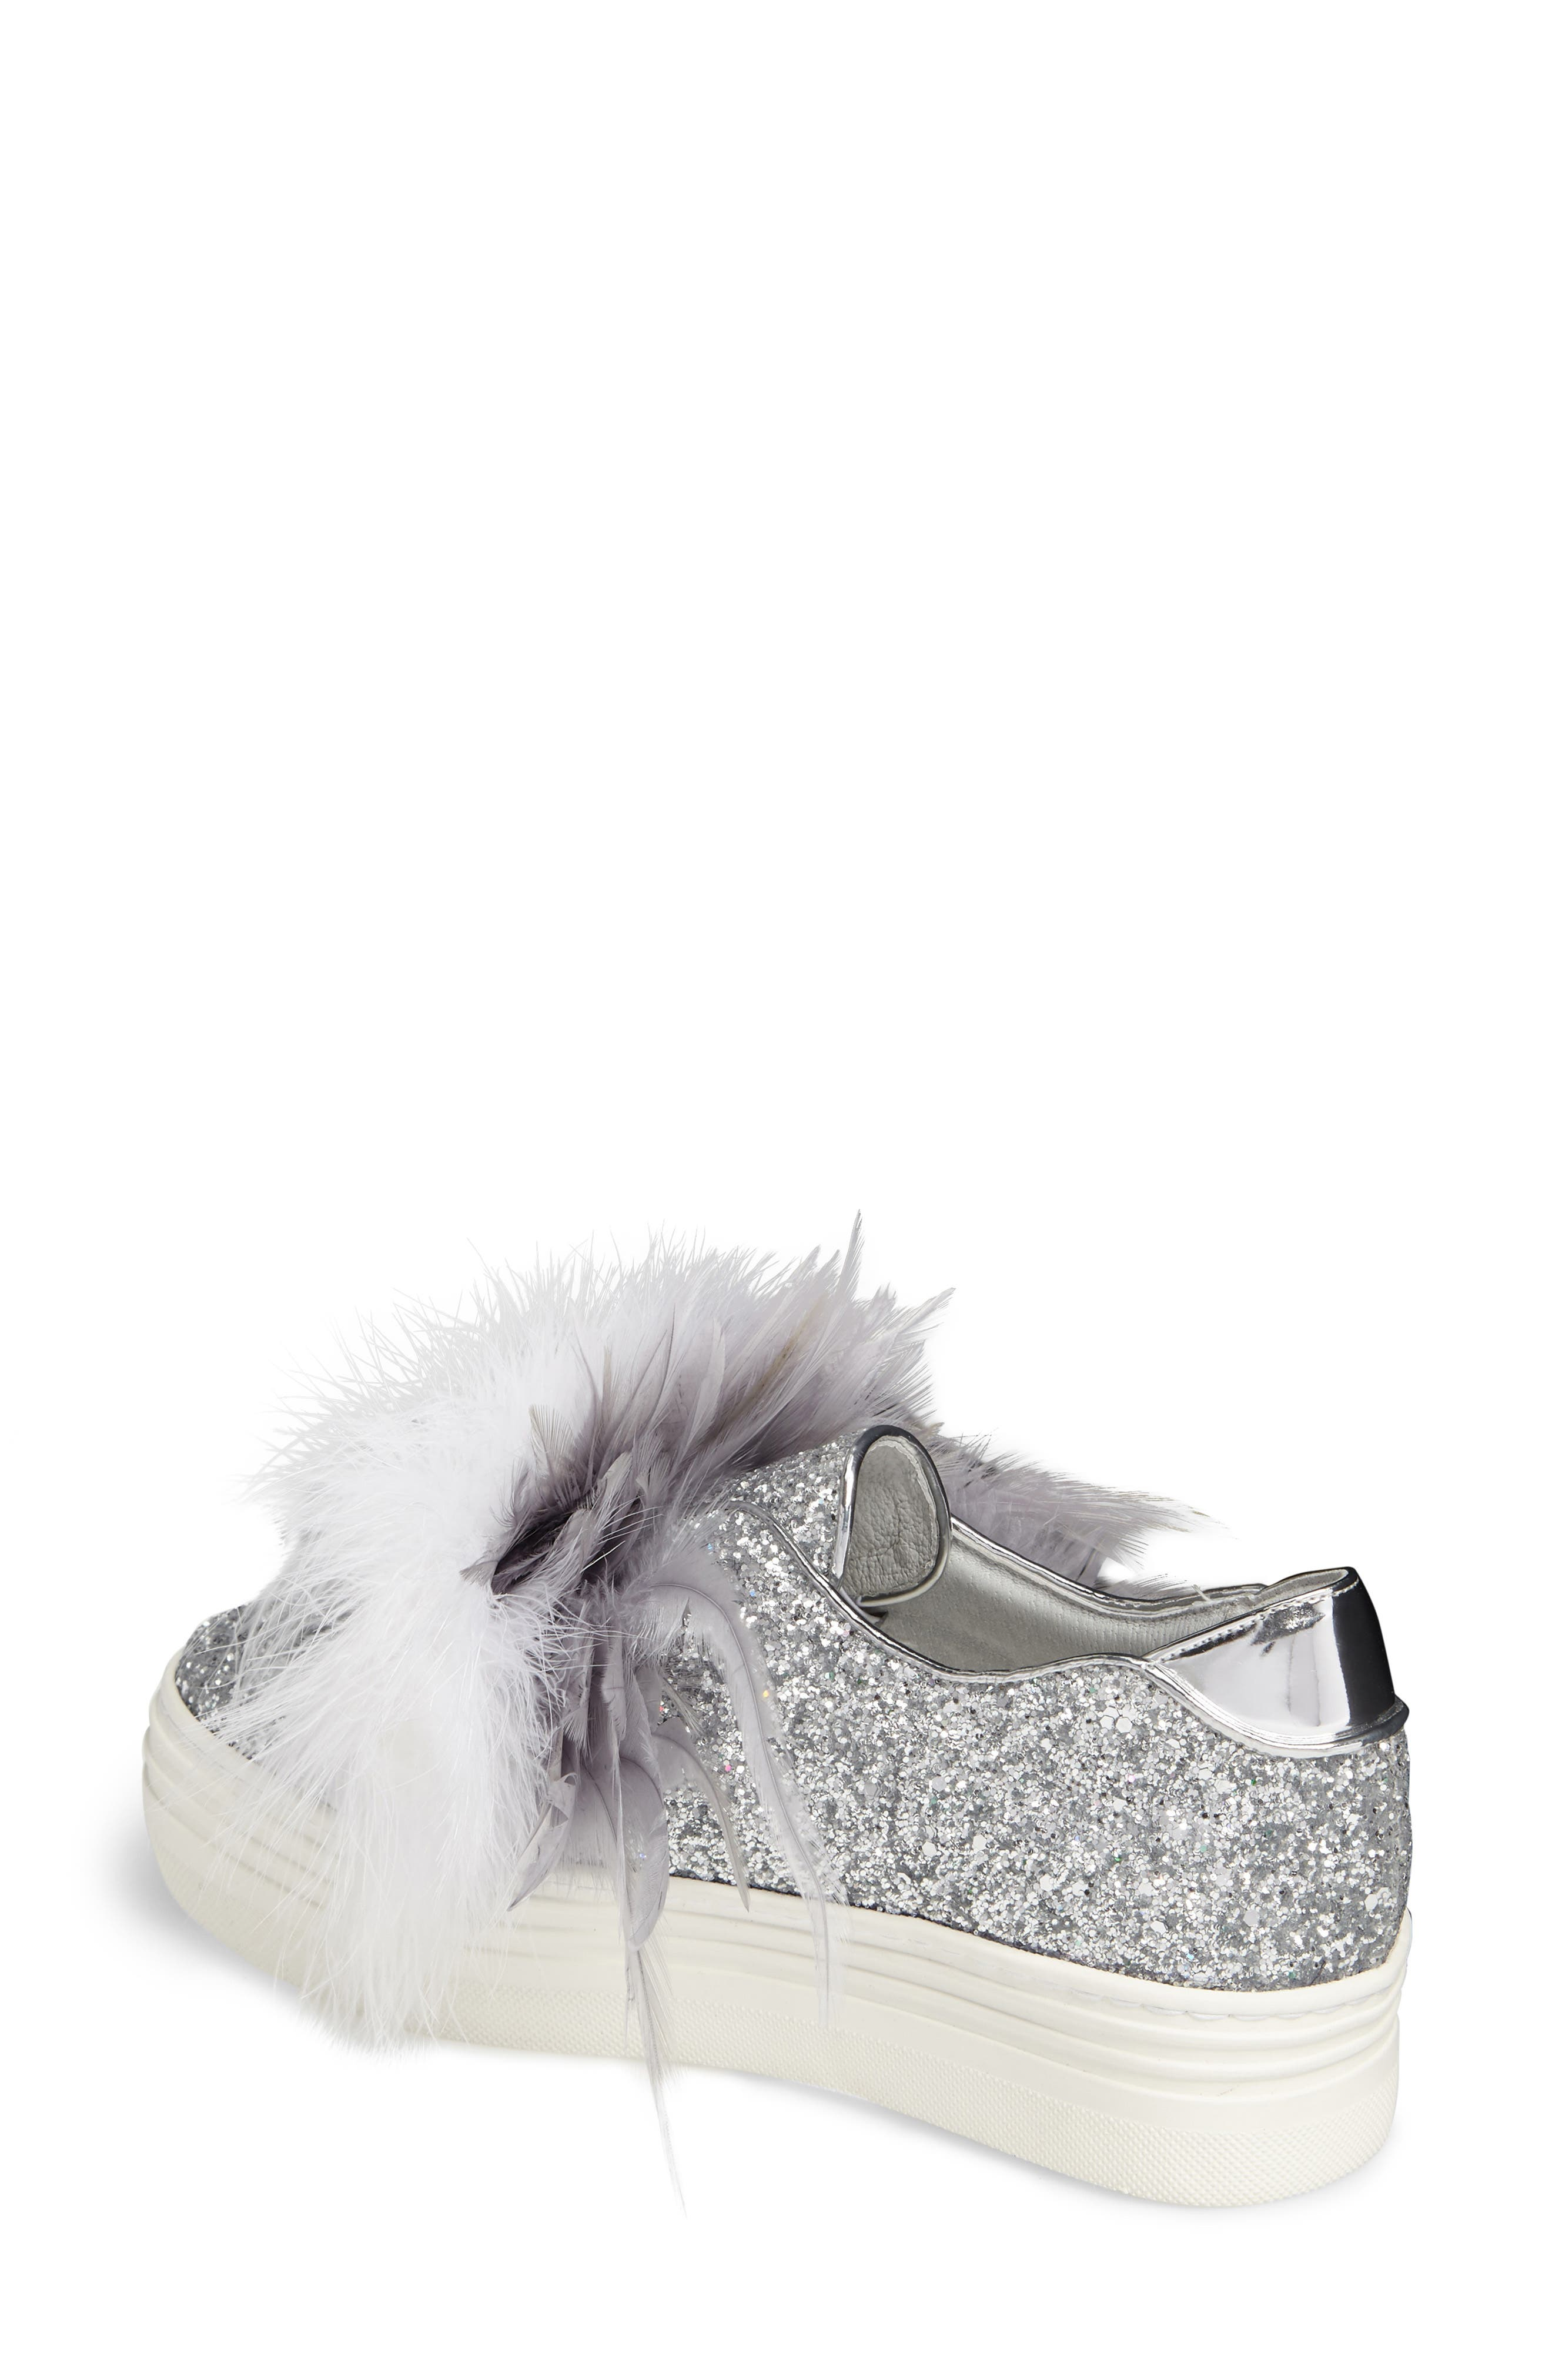 Kate Feathered Slip-On Sneaker,                             Alternate thumbnail 2, color,                             020